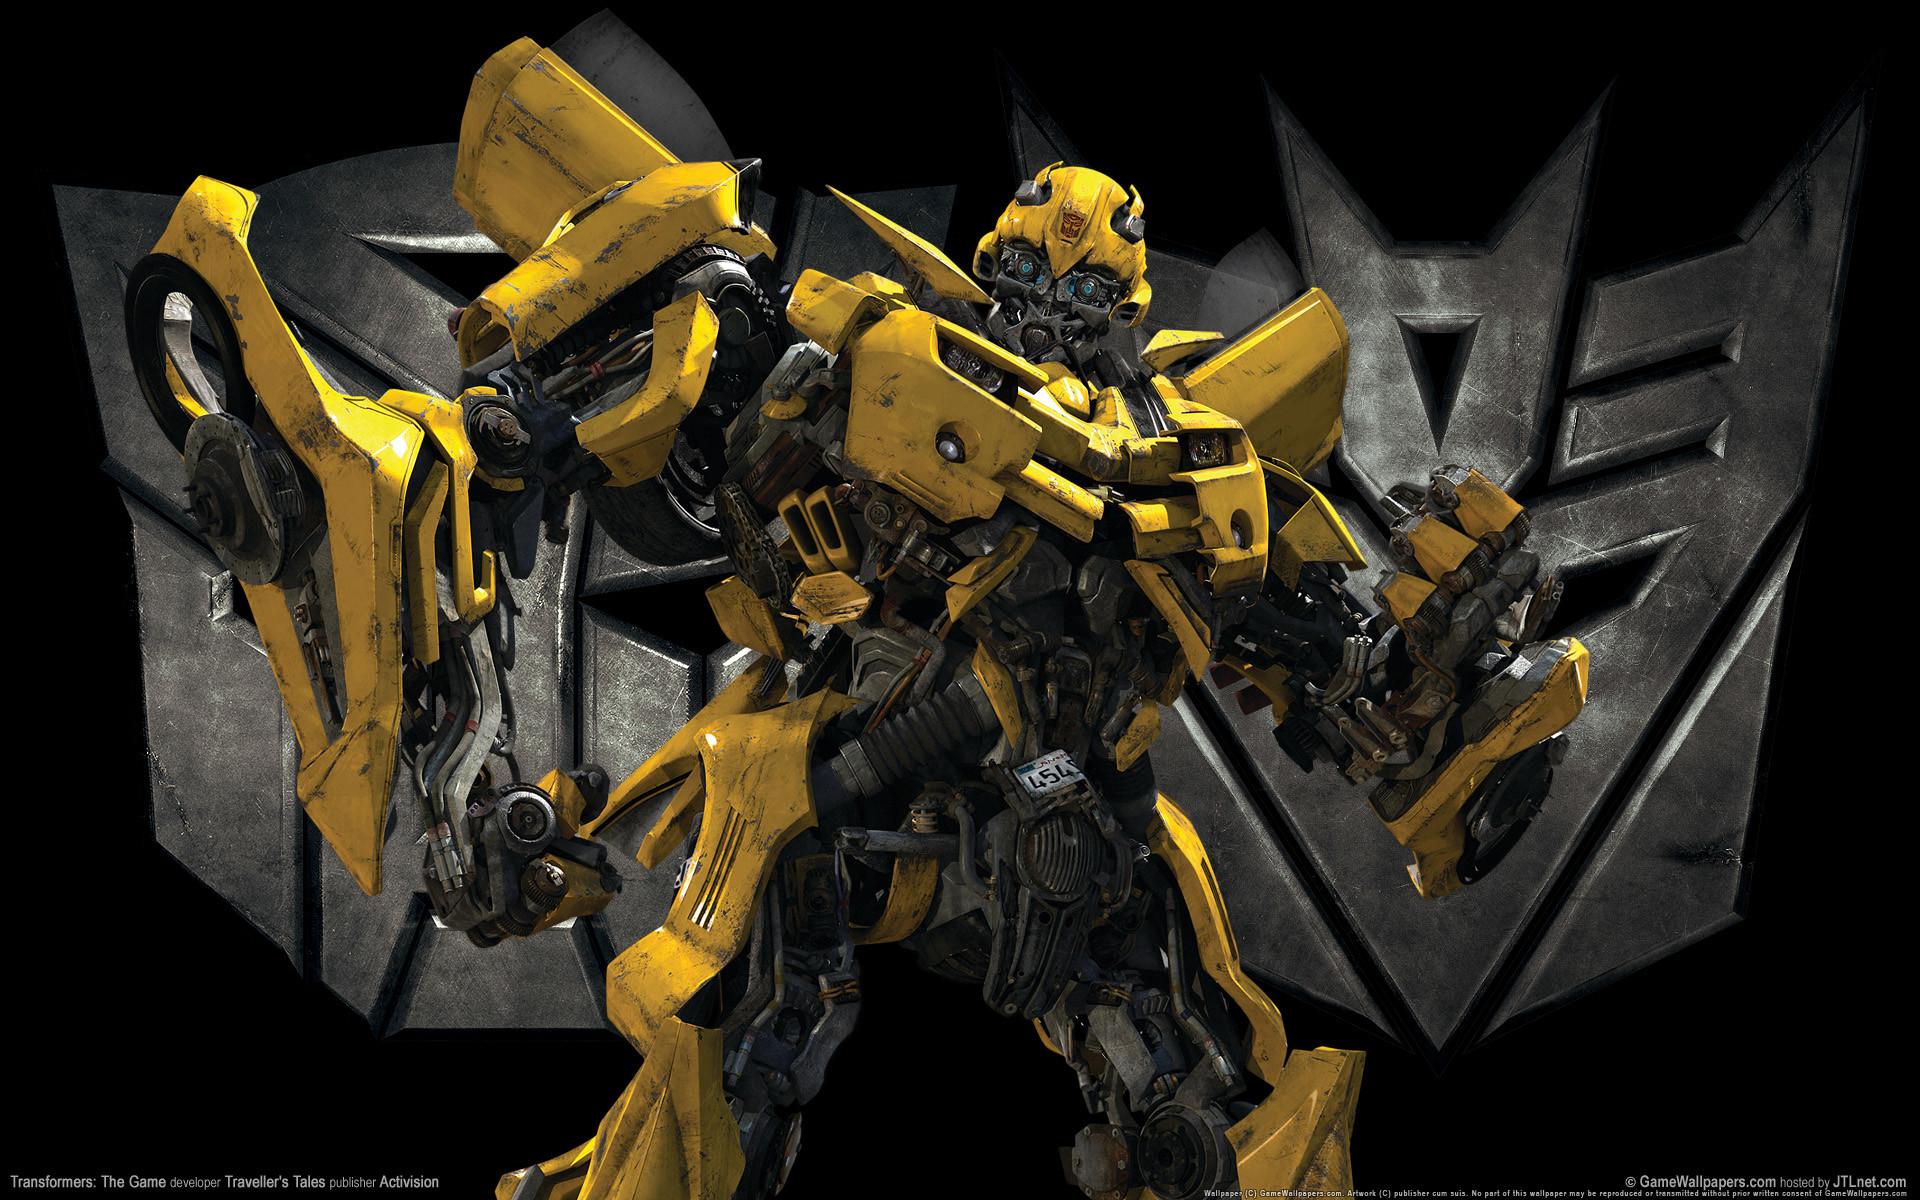 2560x1600 Movie - Transformers: Age of Extinction Movie Transformers Wallpaper